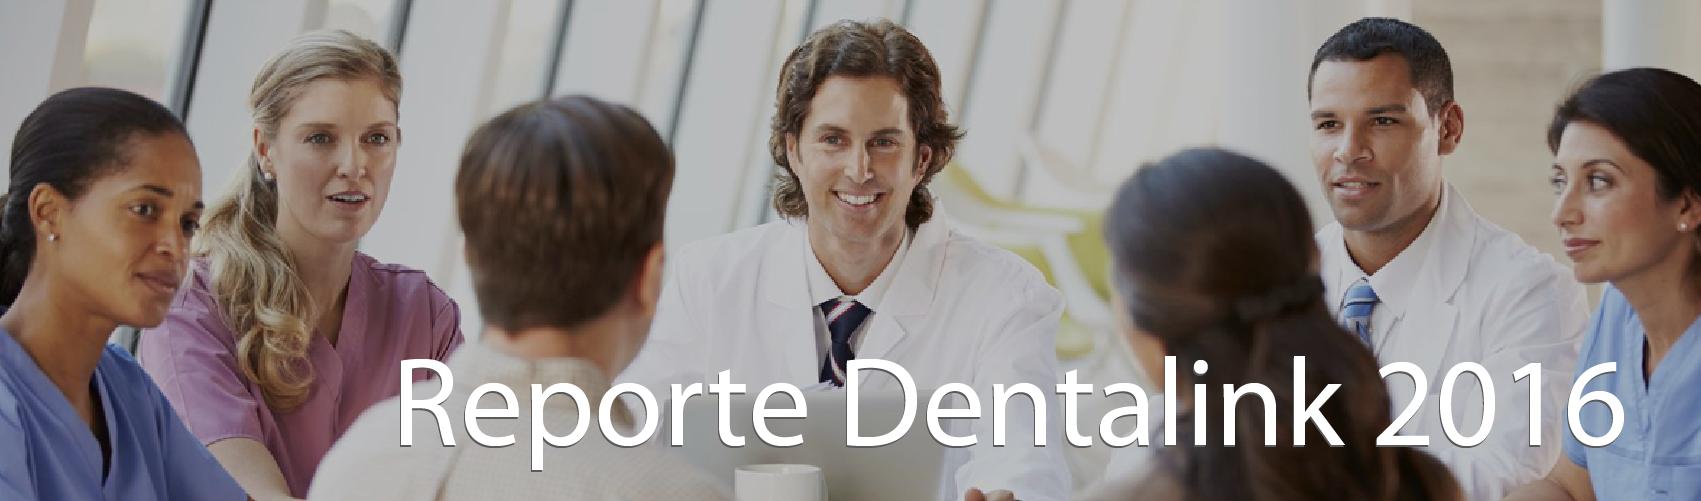 Reporte Dentalink 2016 - El software odontológico